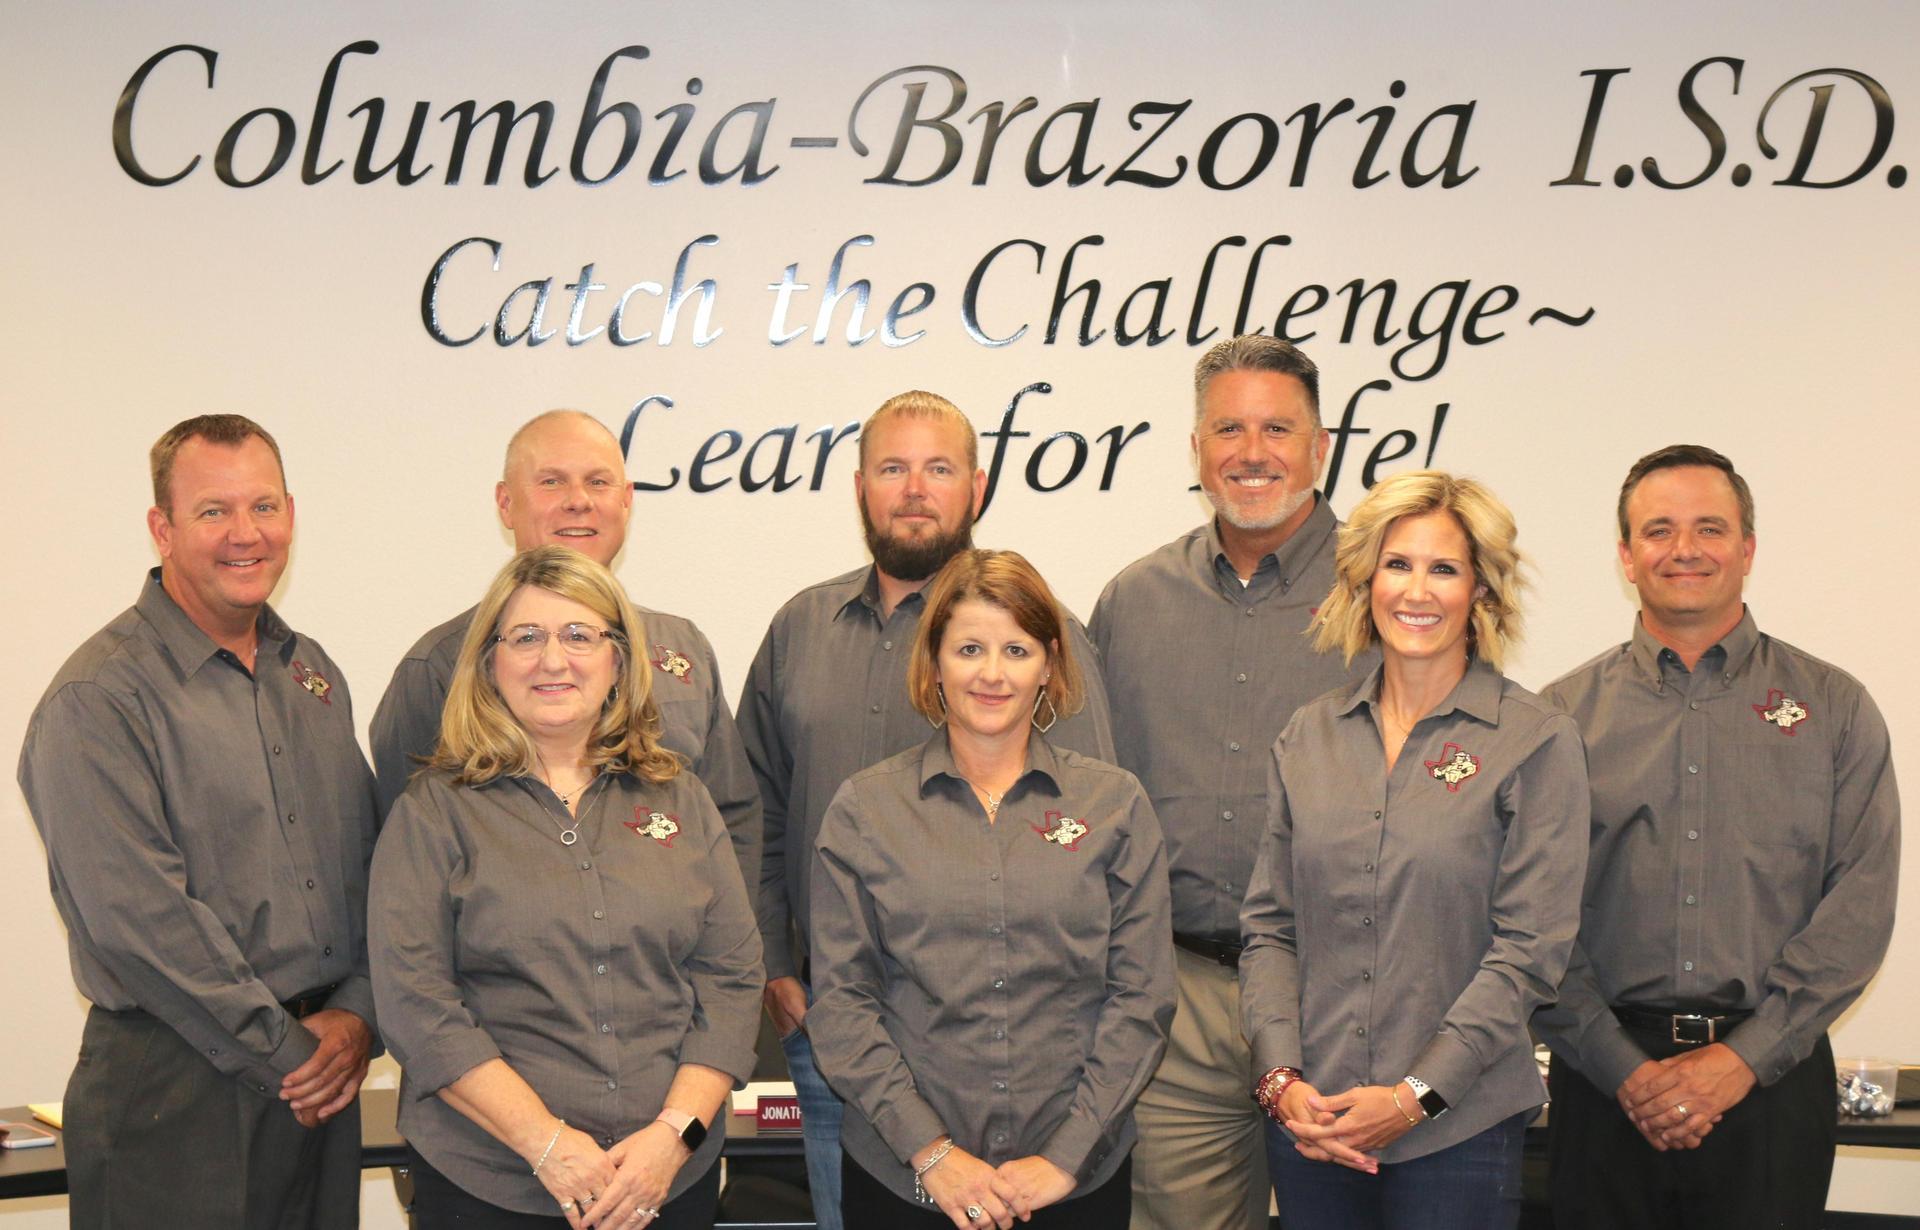 CBISD Board of Trustees